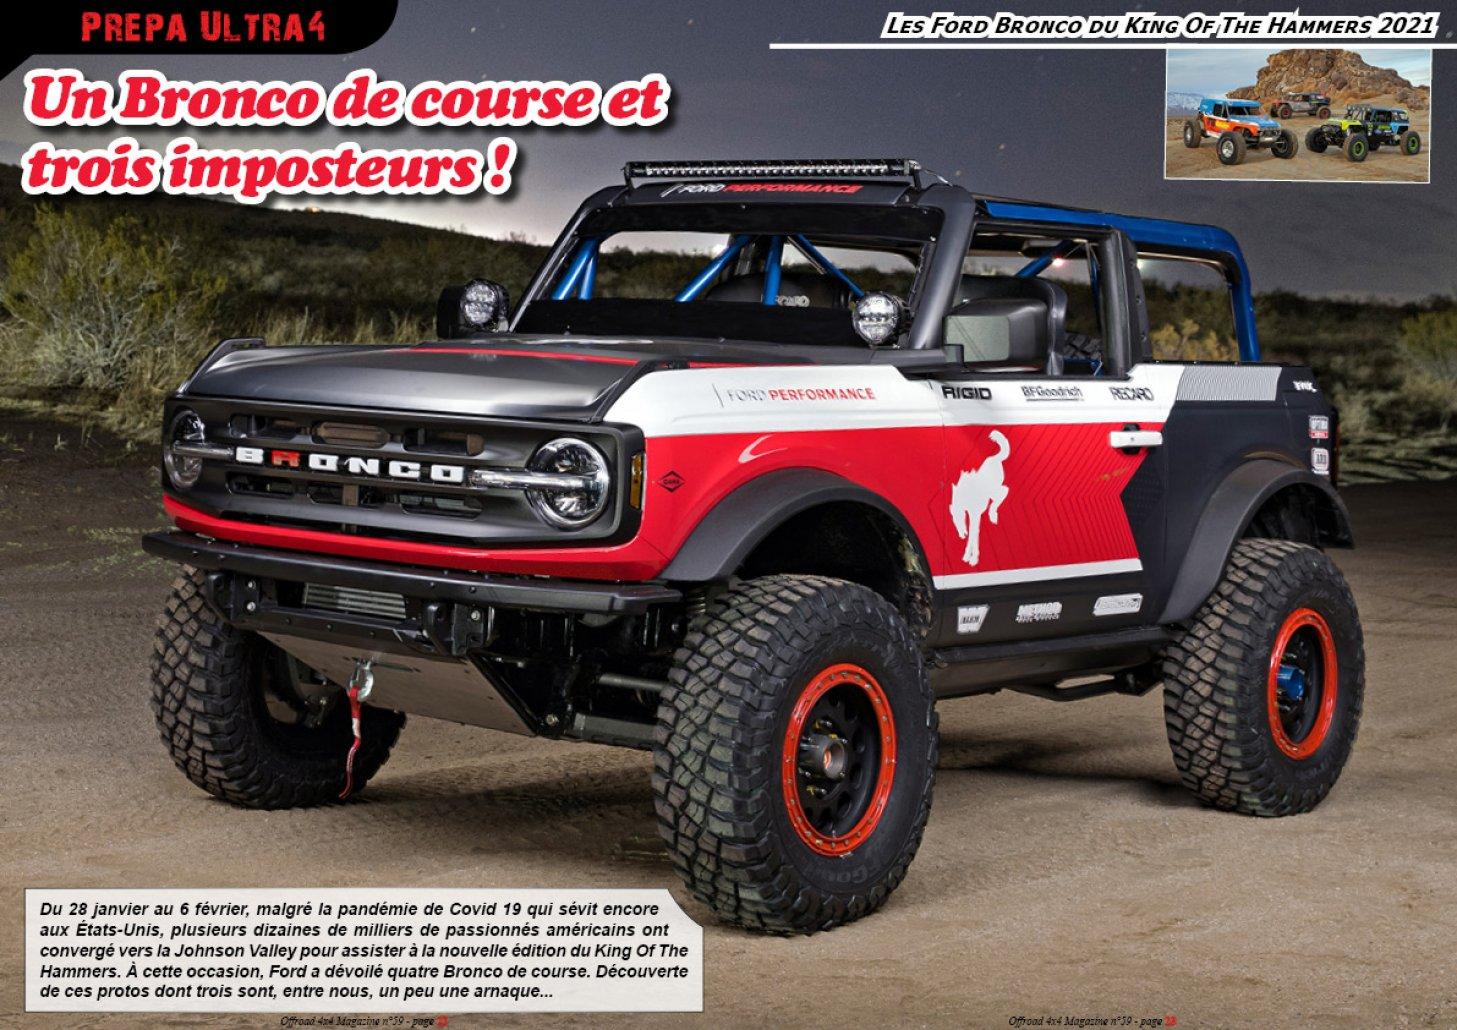 Les Ford Bronco du KOH 2021